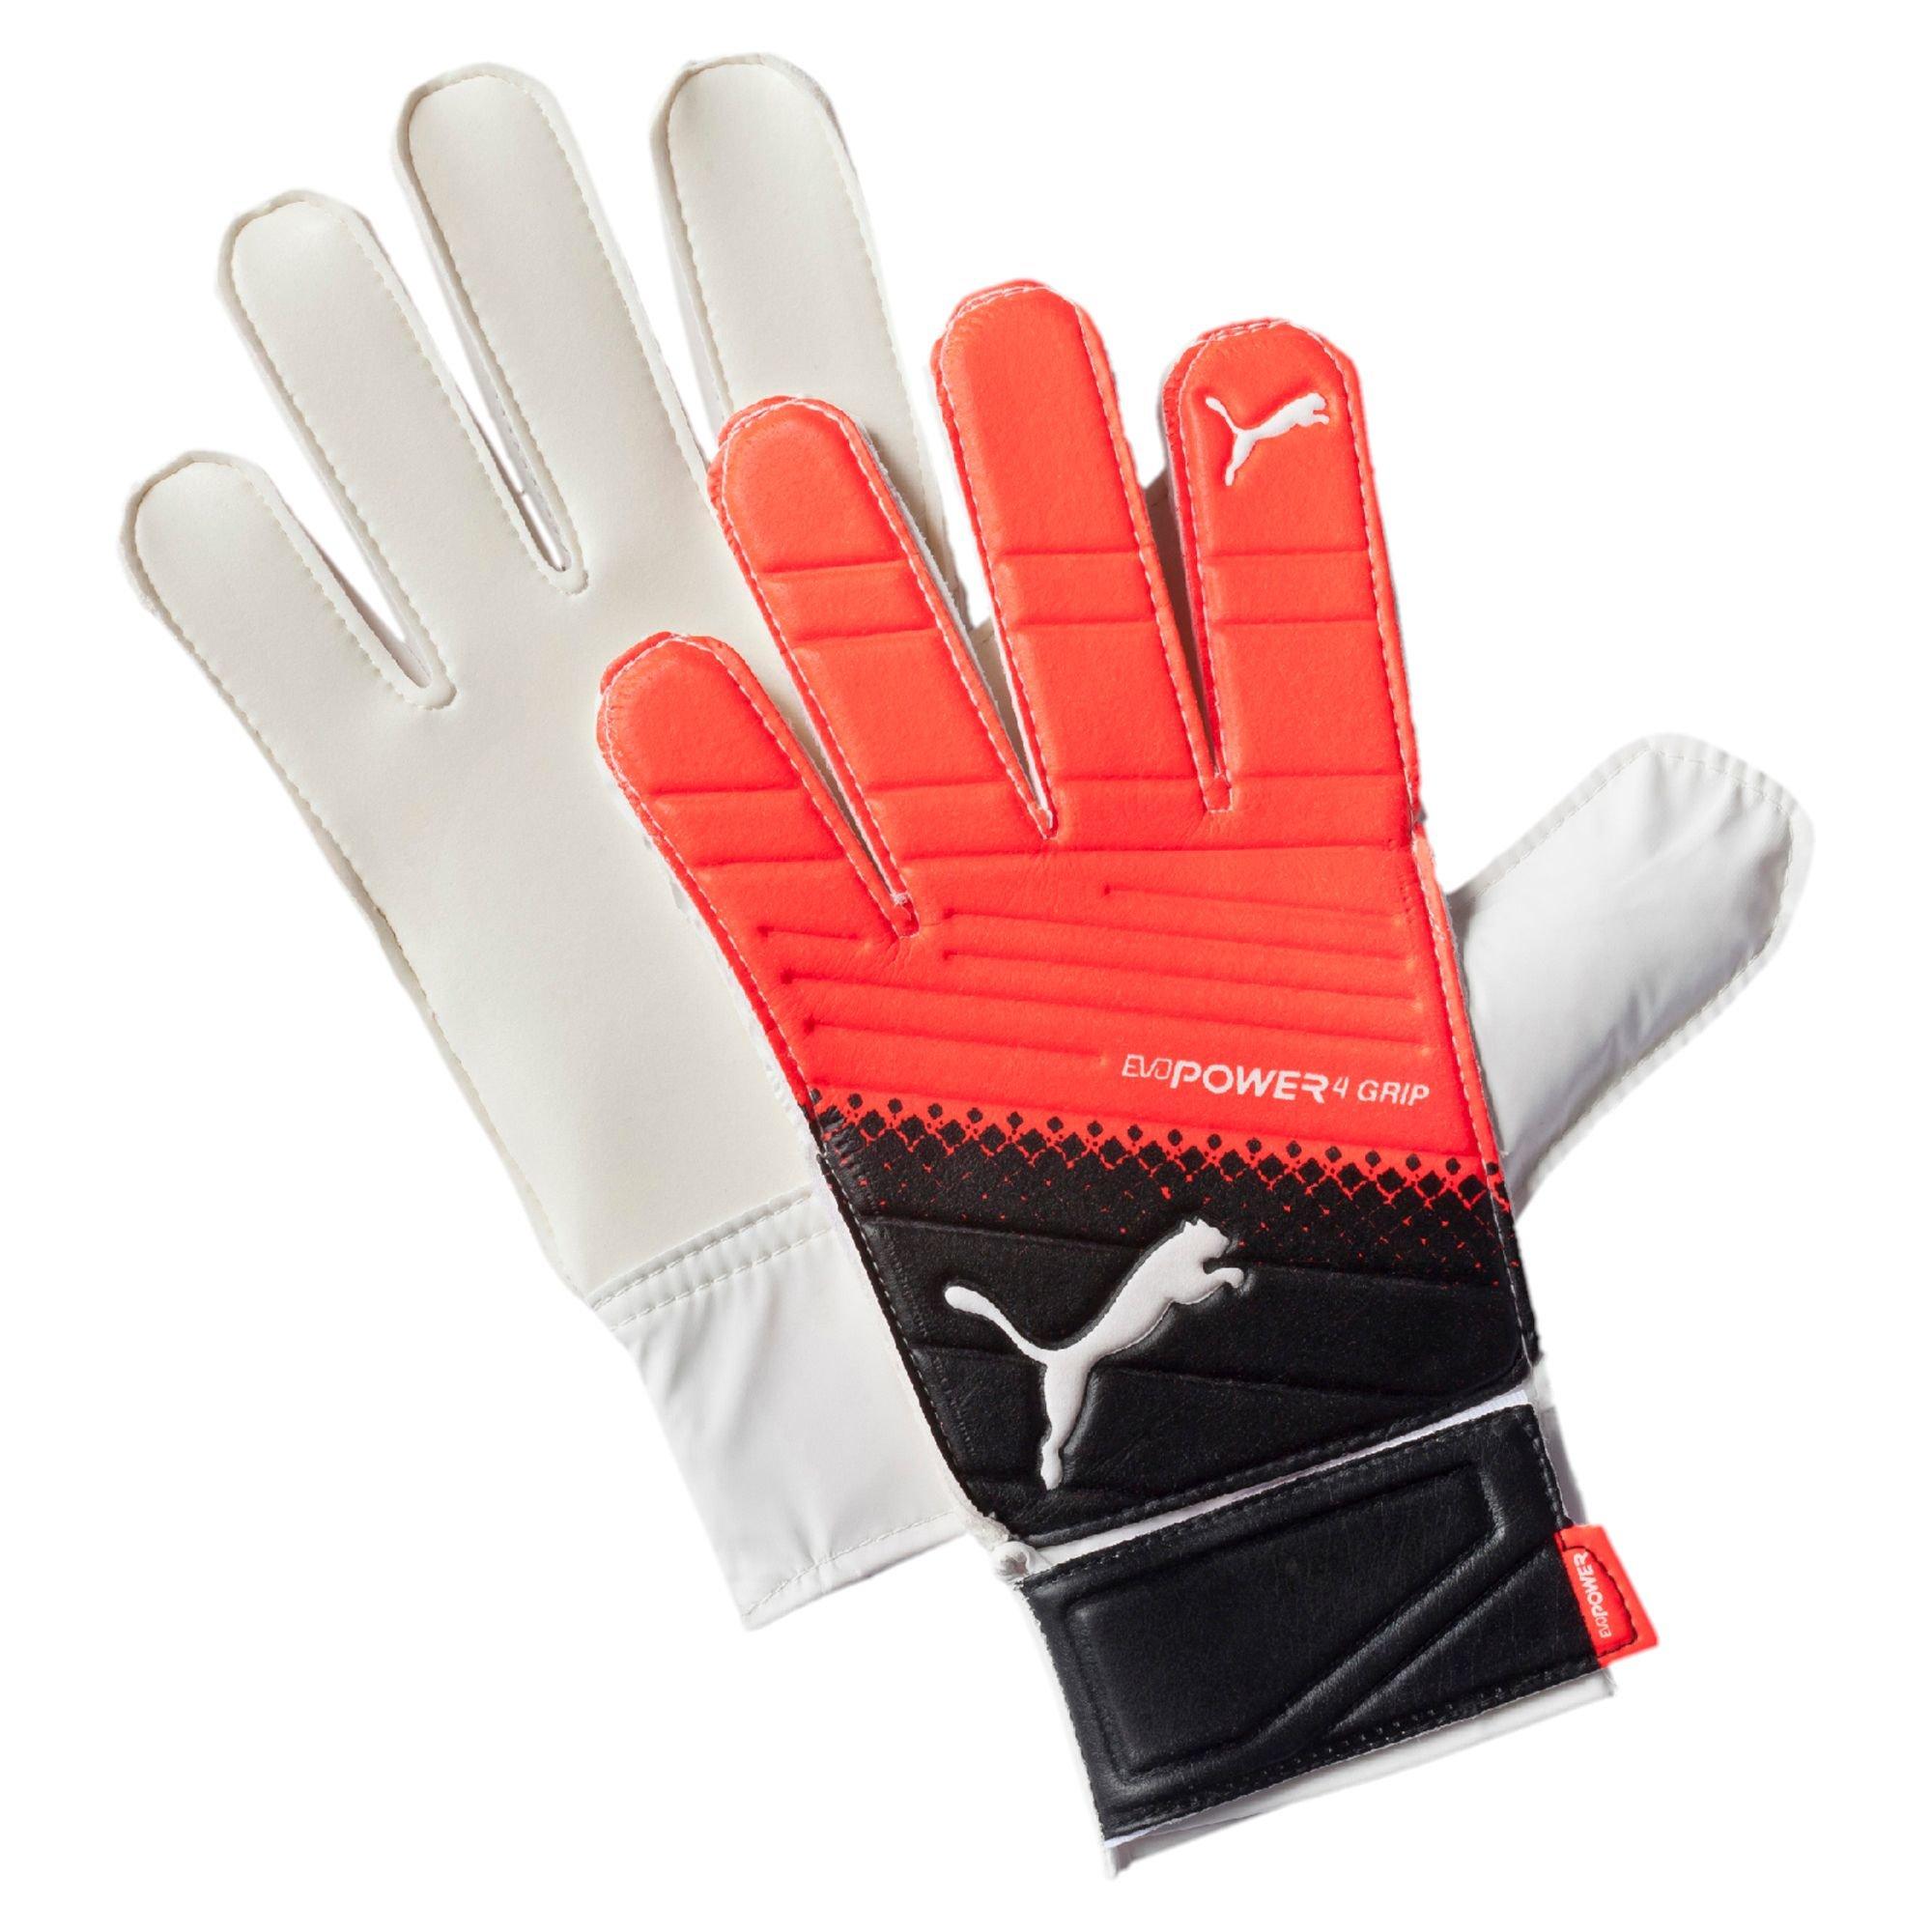 Driving gloves grip -  Puma Evopower Grip 4 3 Goalkeeper Gloves In Red For Men Lyst